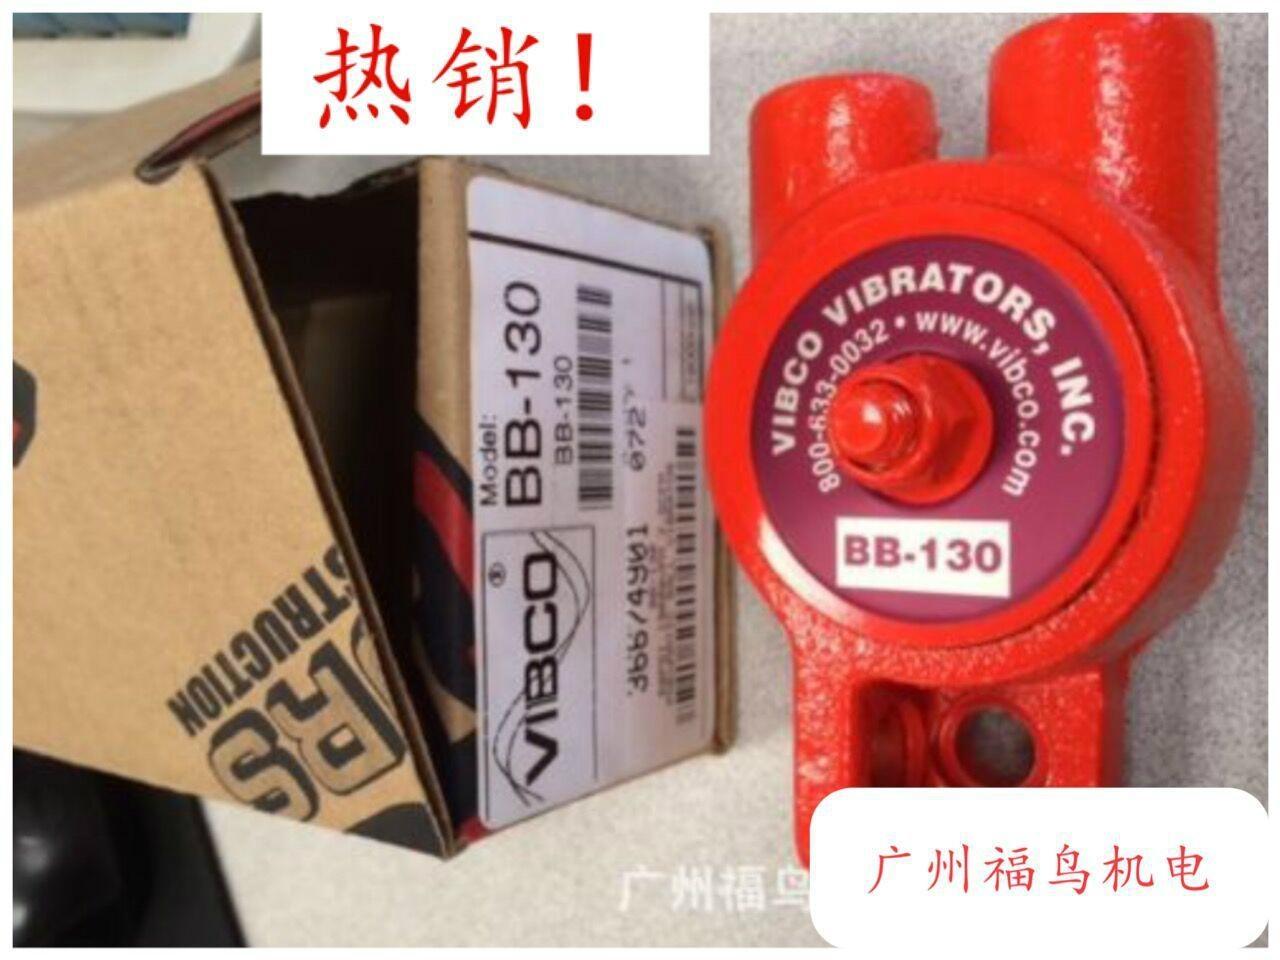 VIBCO振动器, 型号: BB-130